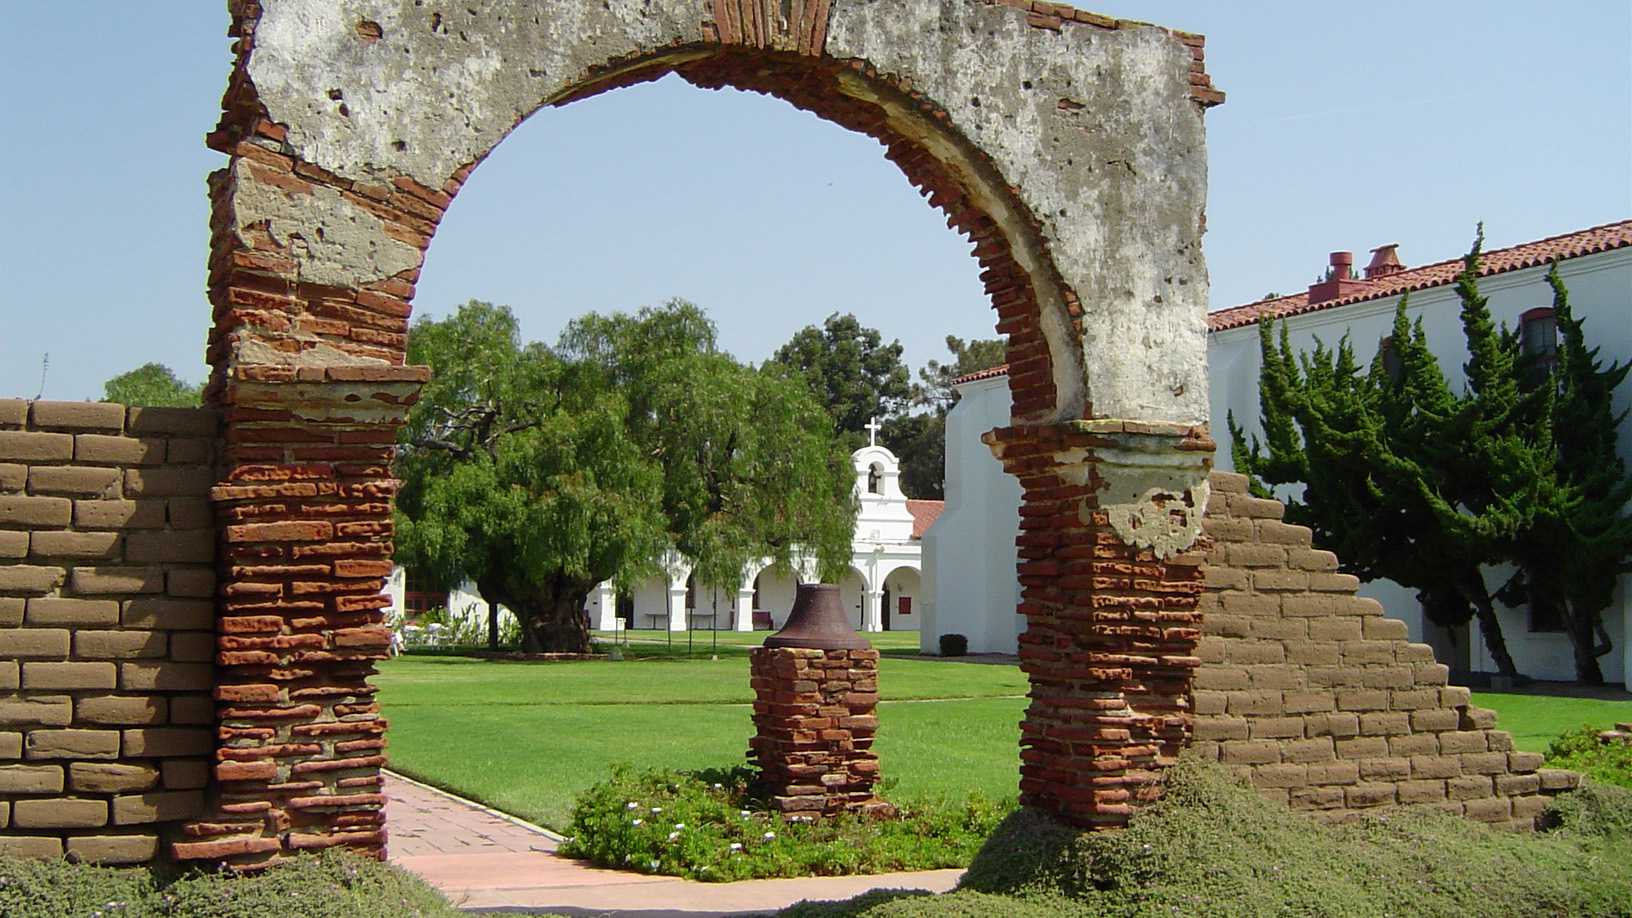 CA_SanDiego_Mission_San_Luis_Rey_de_Francia_UserGeographer_WikimediaCommons_006_sig.jpg